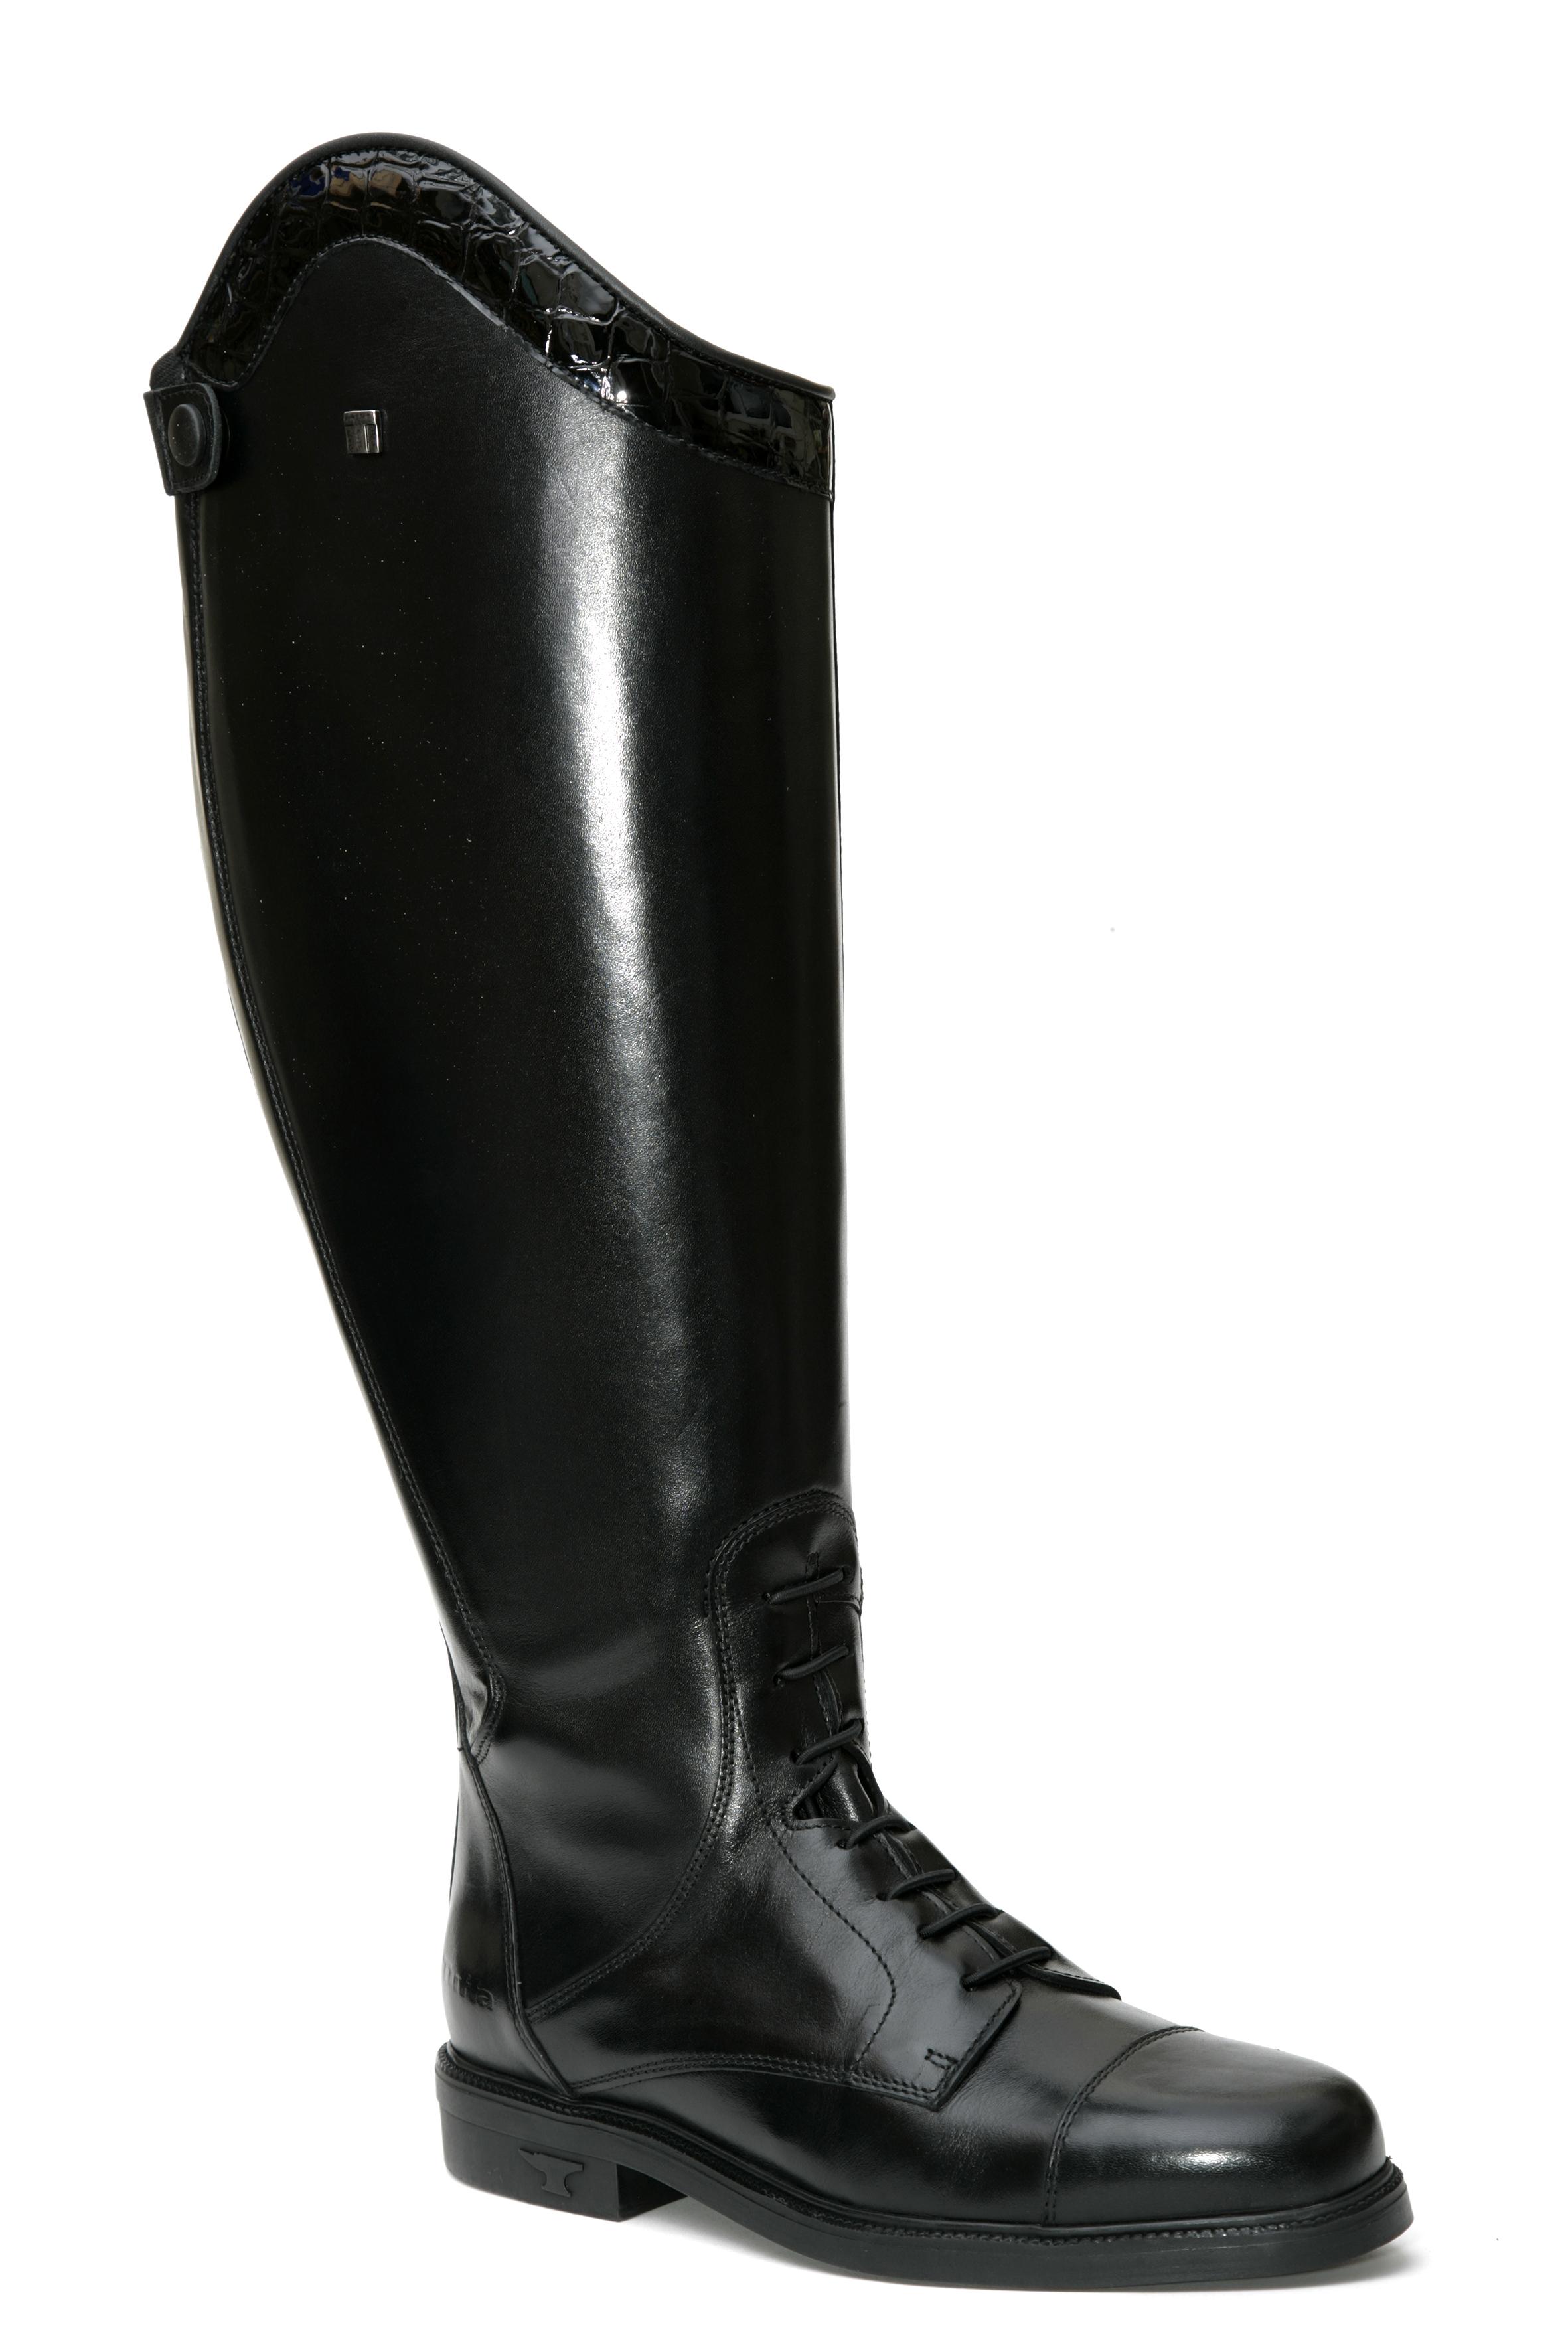 riding boots, riding boots, riding boots | Horse | Reitstil